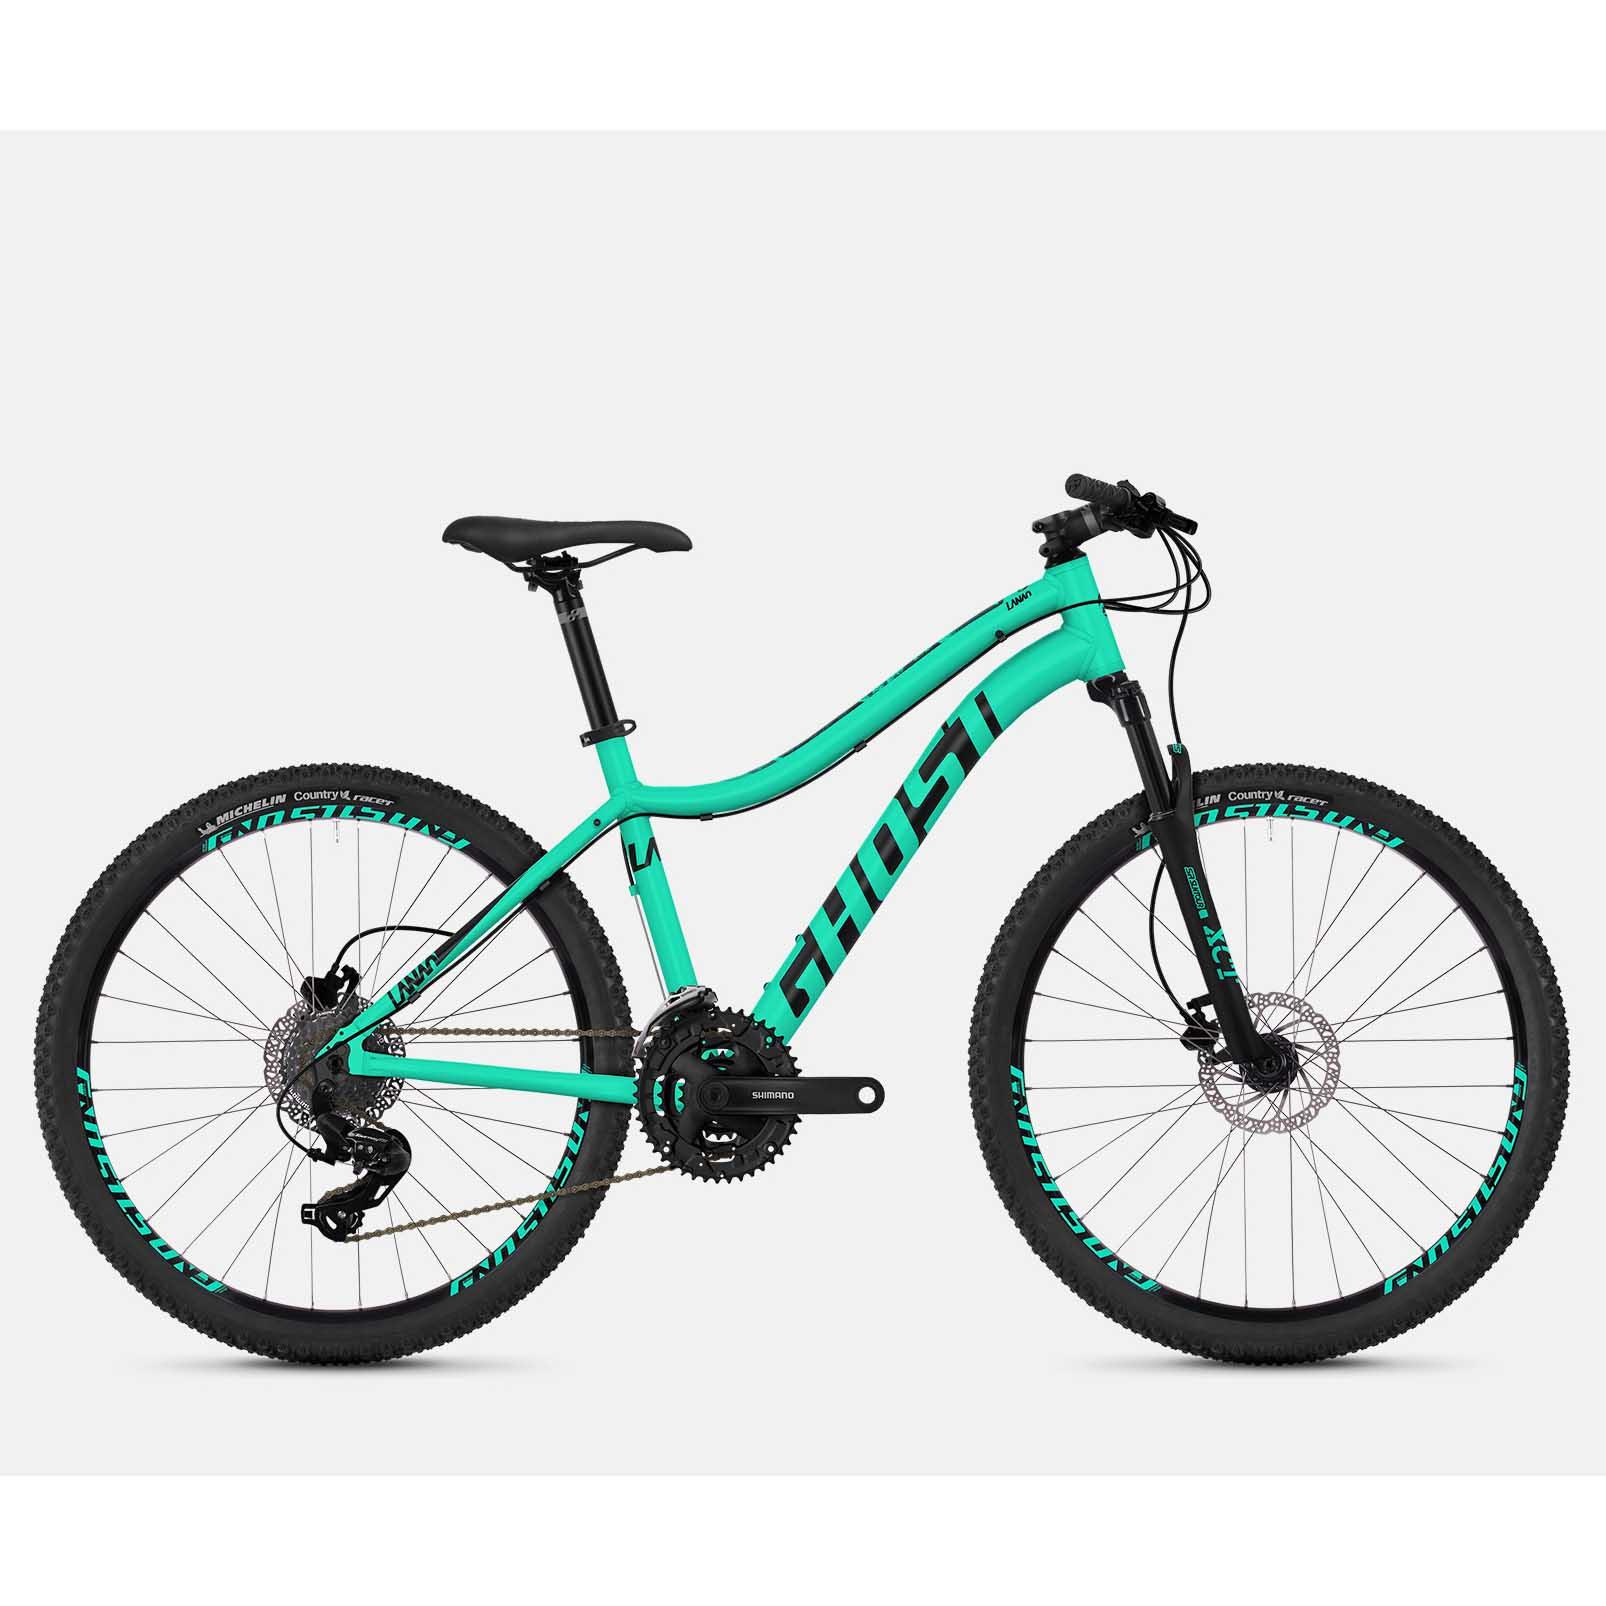 Фото Велосипед Ghost Lanao 1.6 26″ ,рама S, бирюзово-черный,  2019